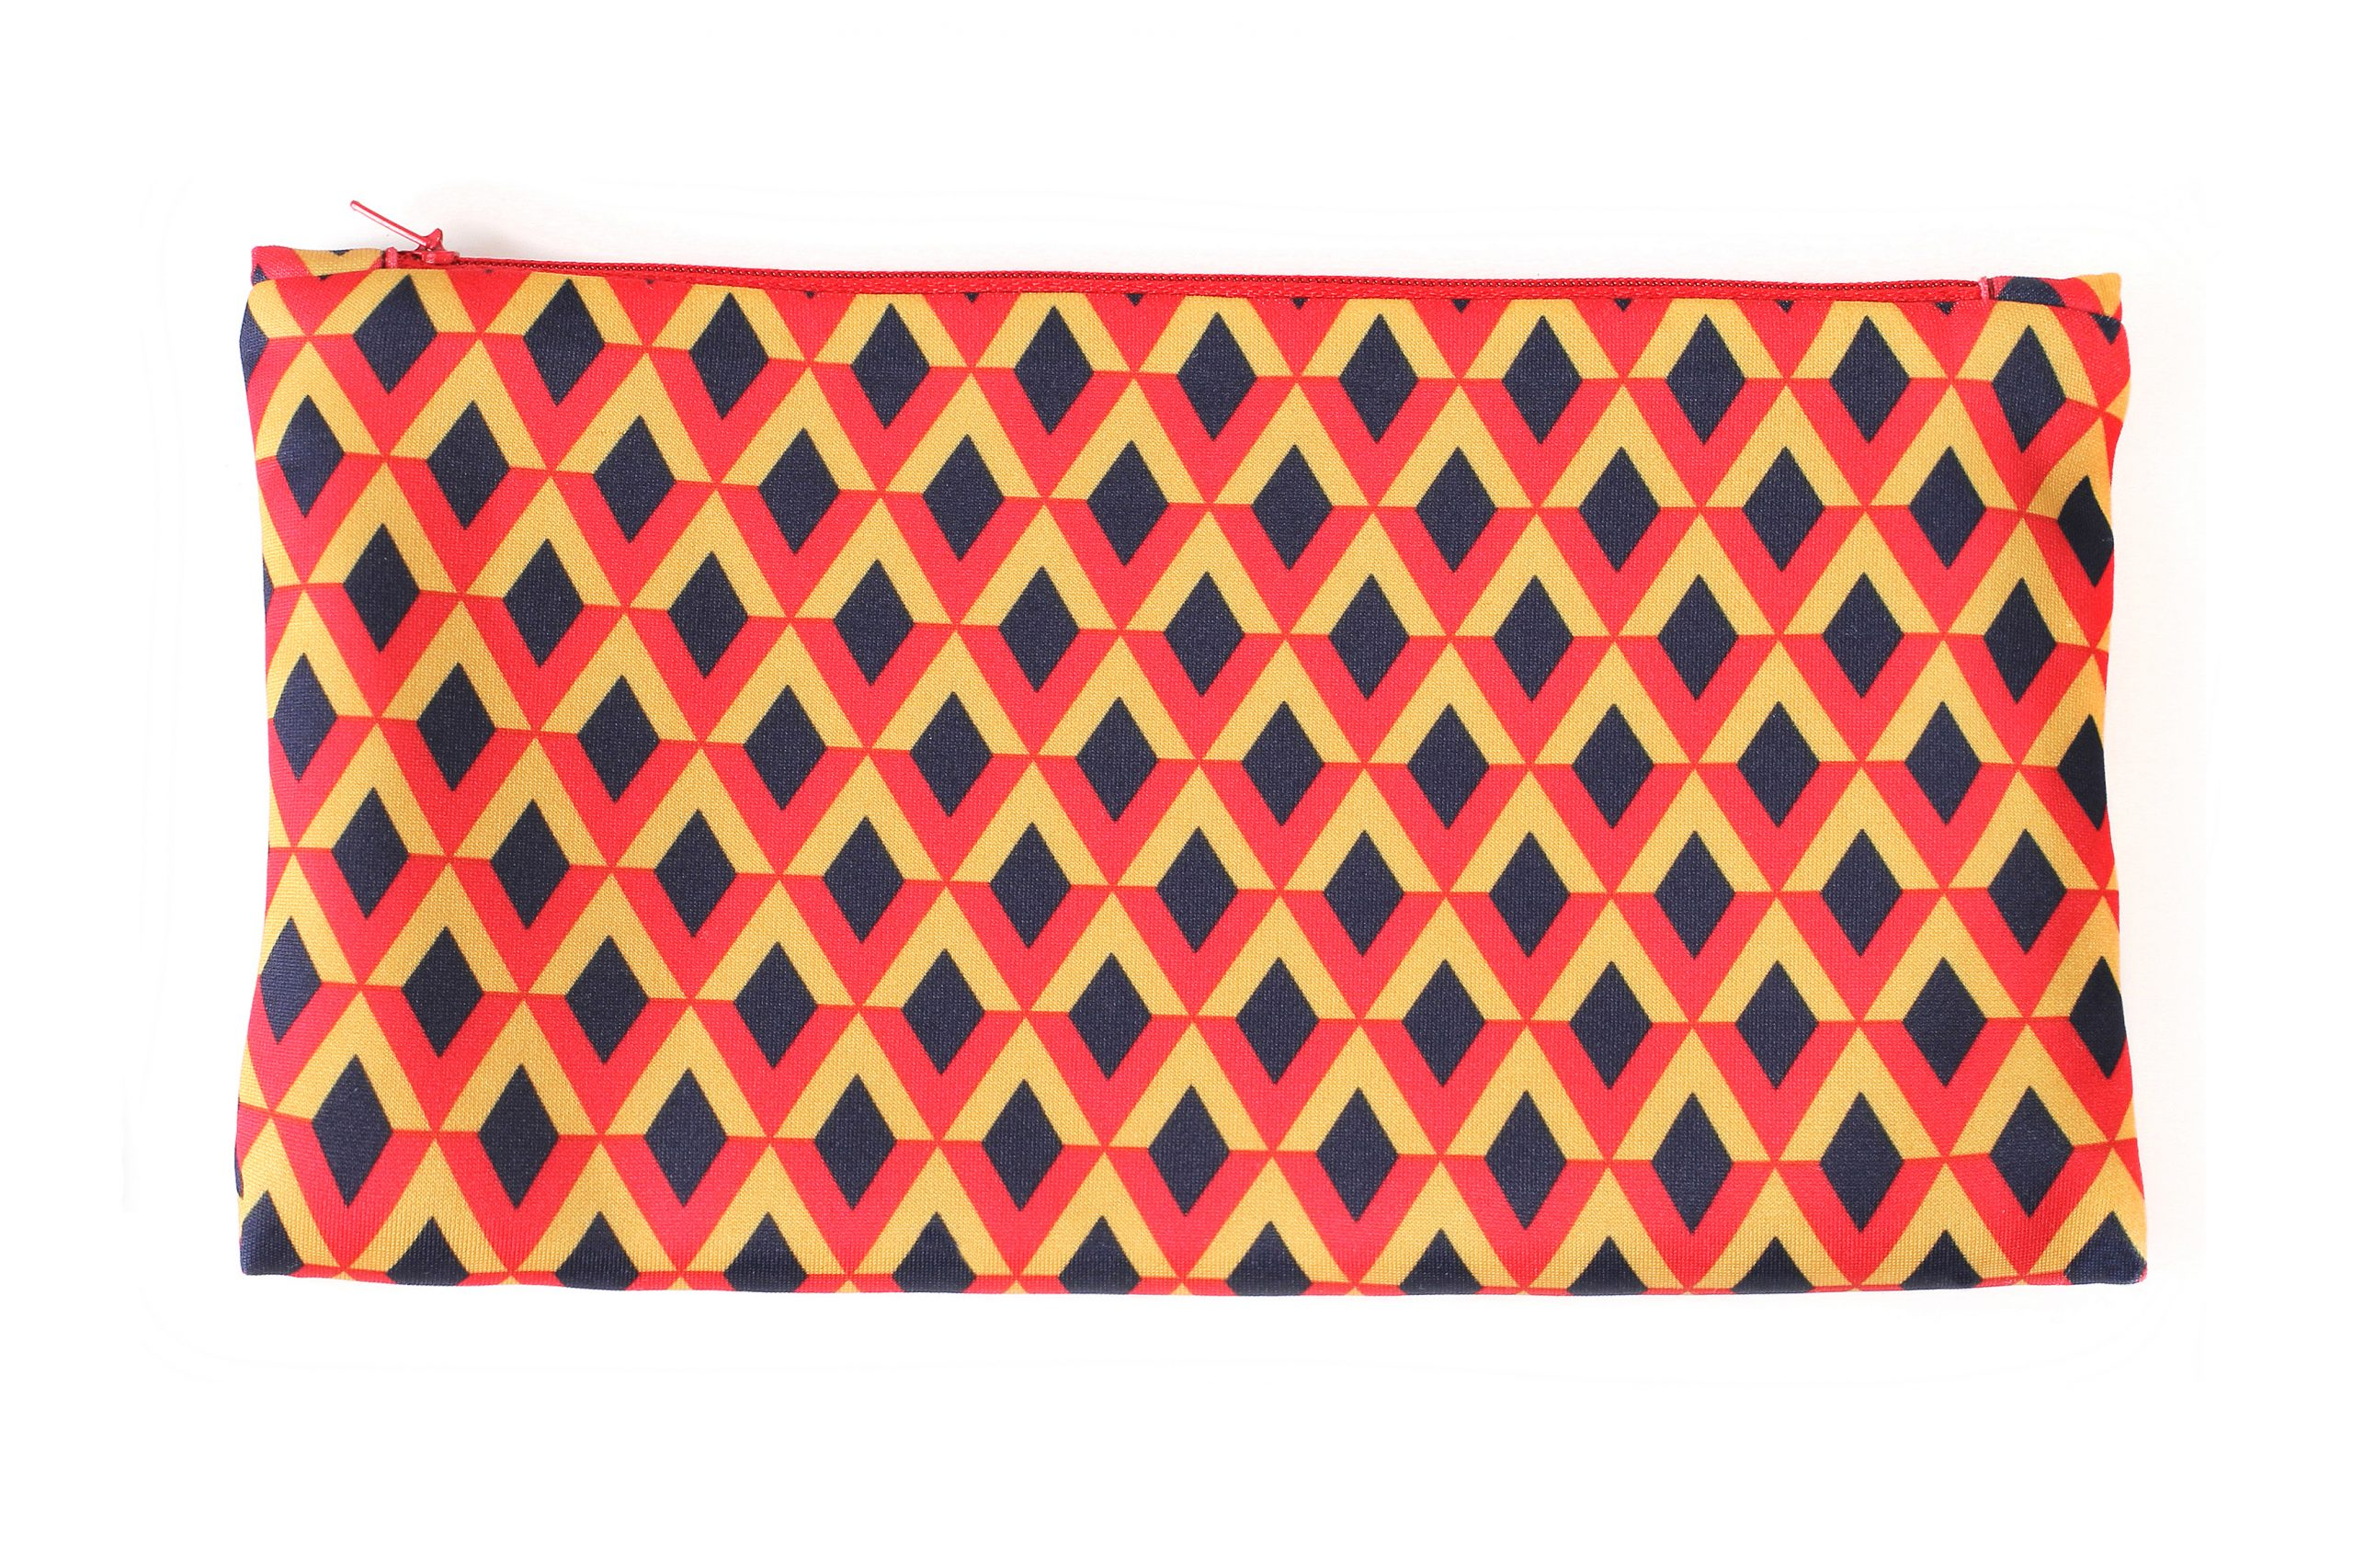 Funky Diamonds Clutch bag – Evening clutch bags Online